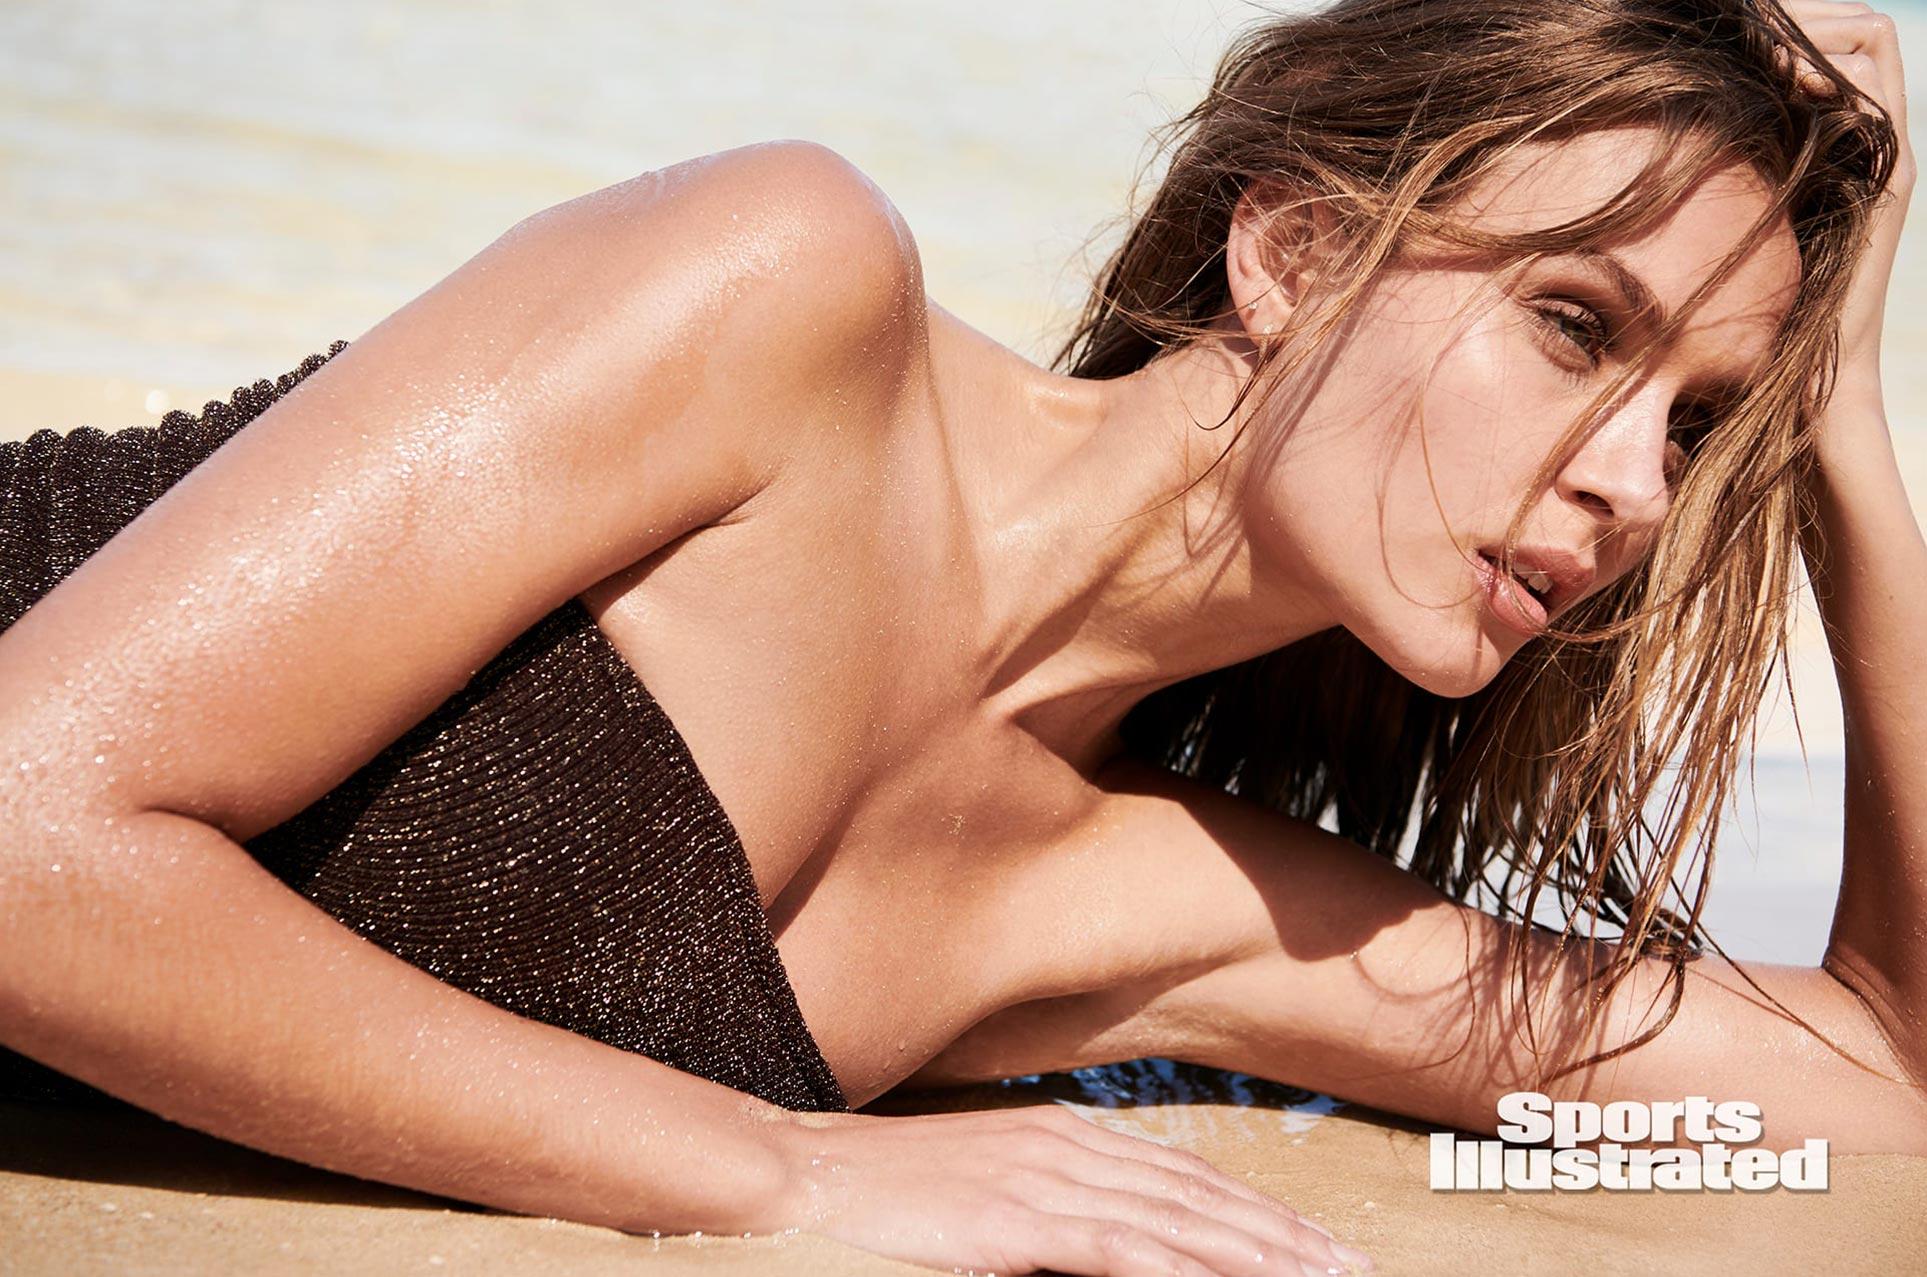 Жозефин Скривер в каталоге купальников Sports Illustrated Swimsuit 2020 / фото 19